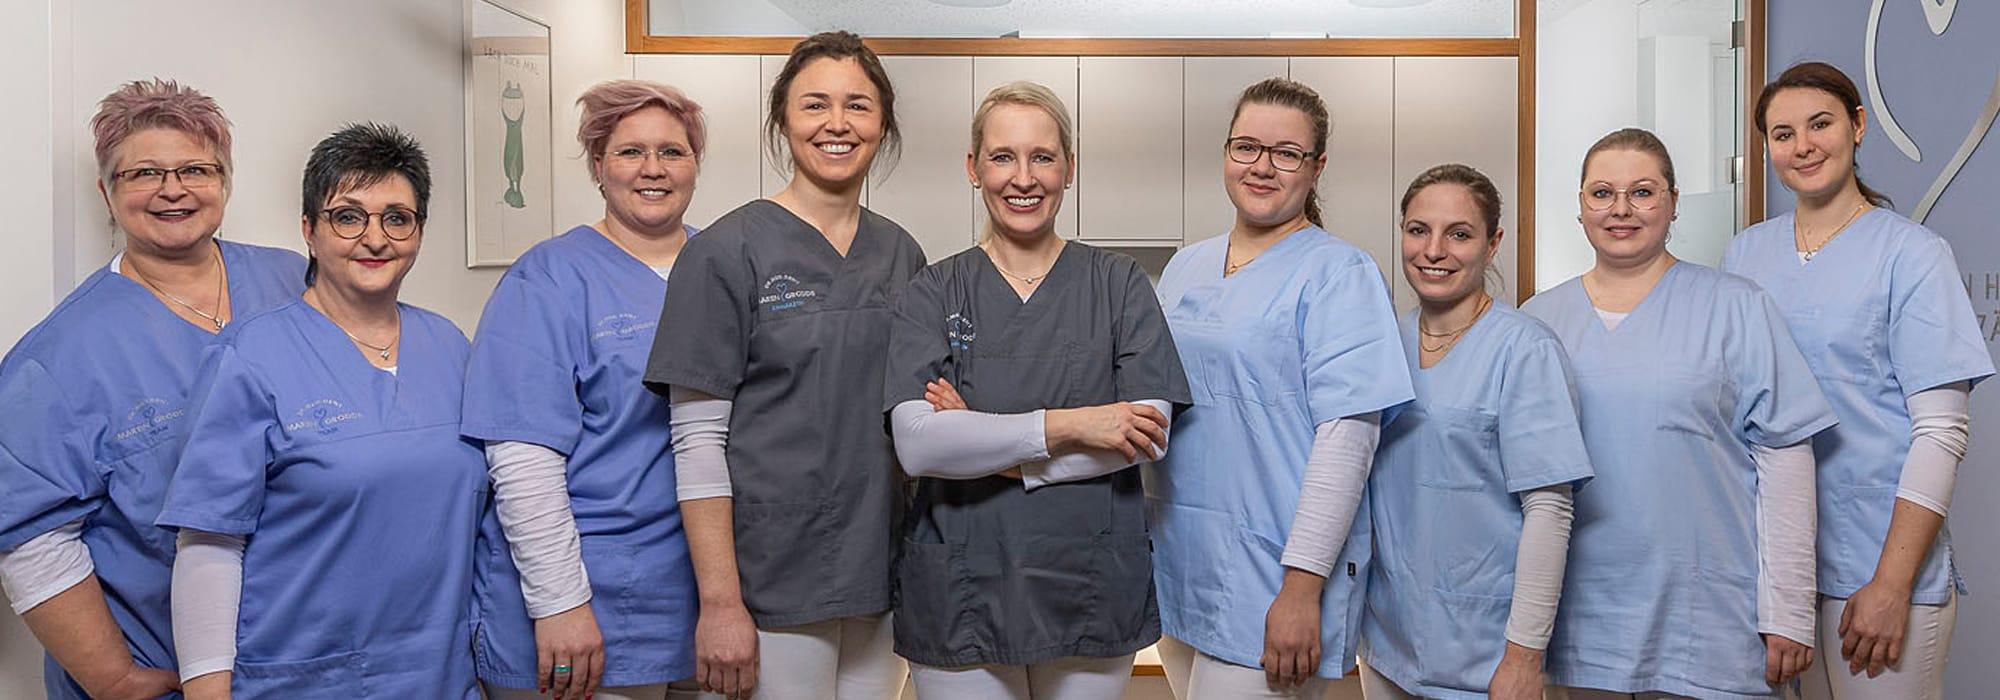 zahnarzt-team-dr-grodde-heidelberg